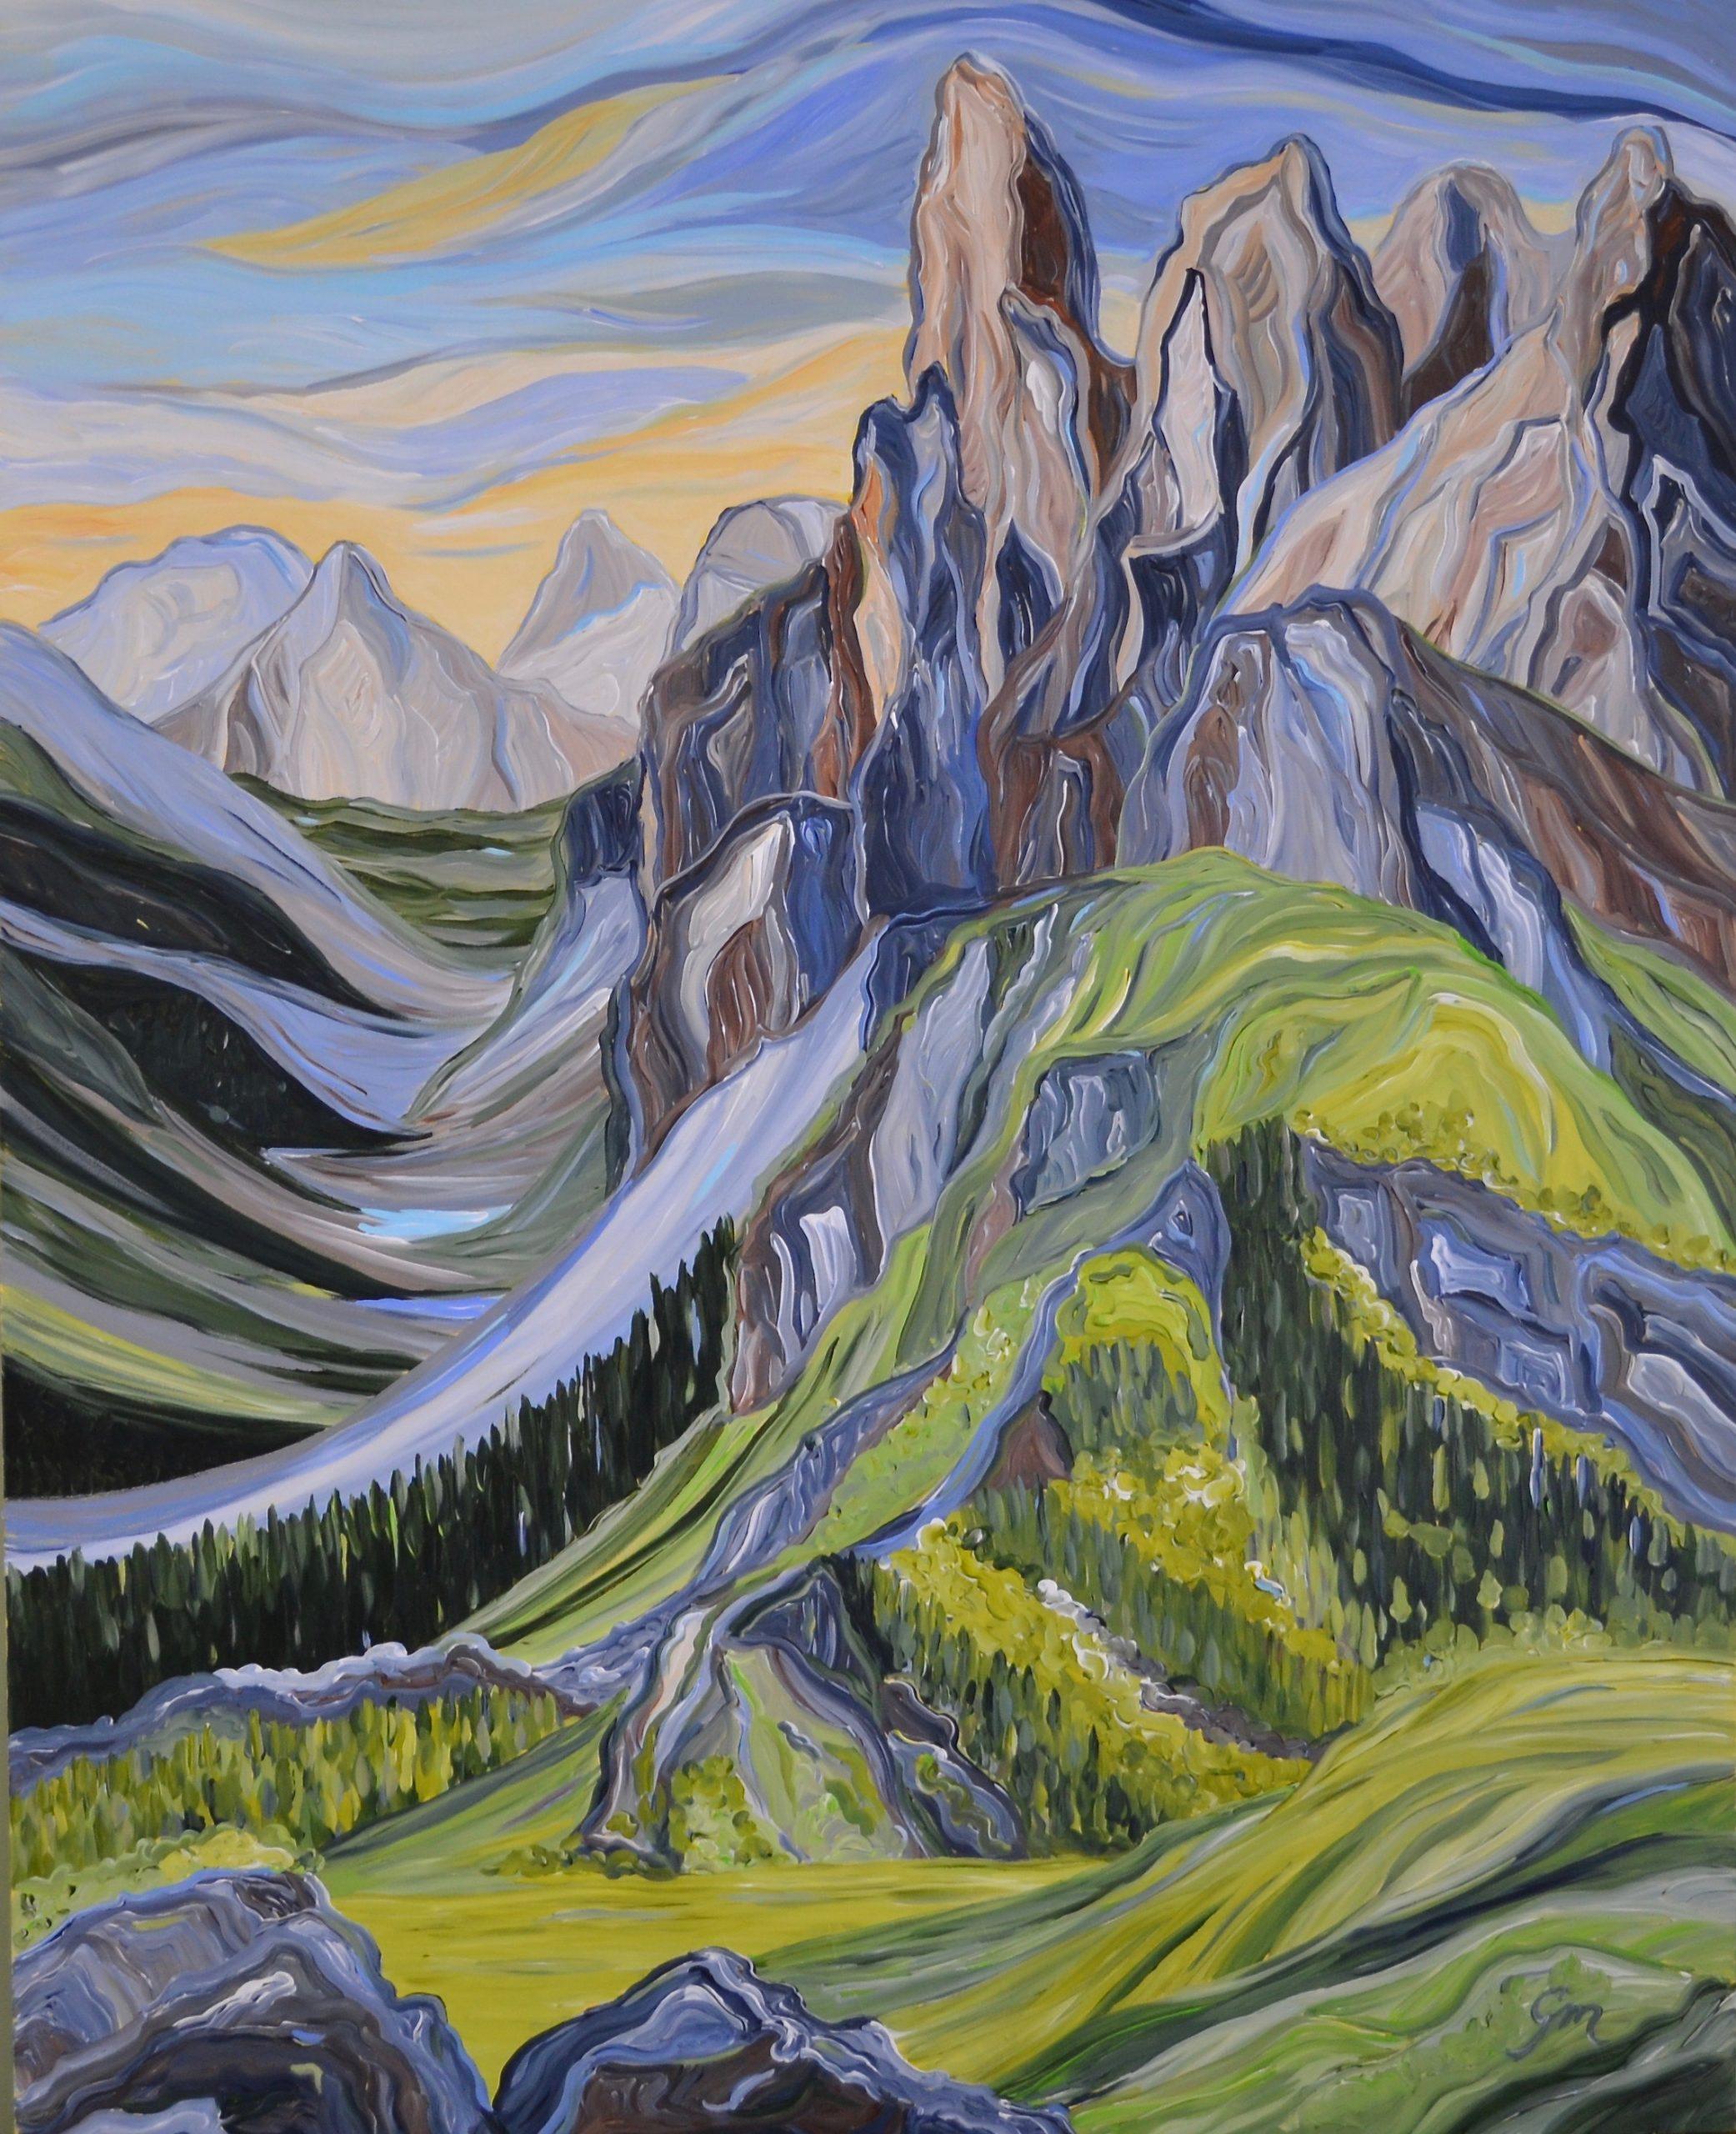 © Gisa Mayer Spring Sonata, Acrylic on Canvas